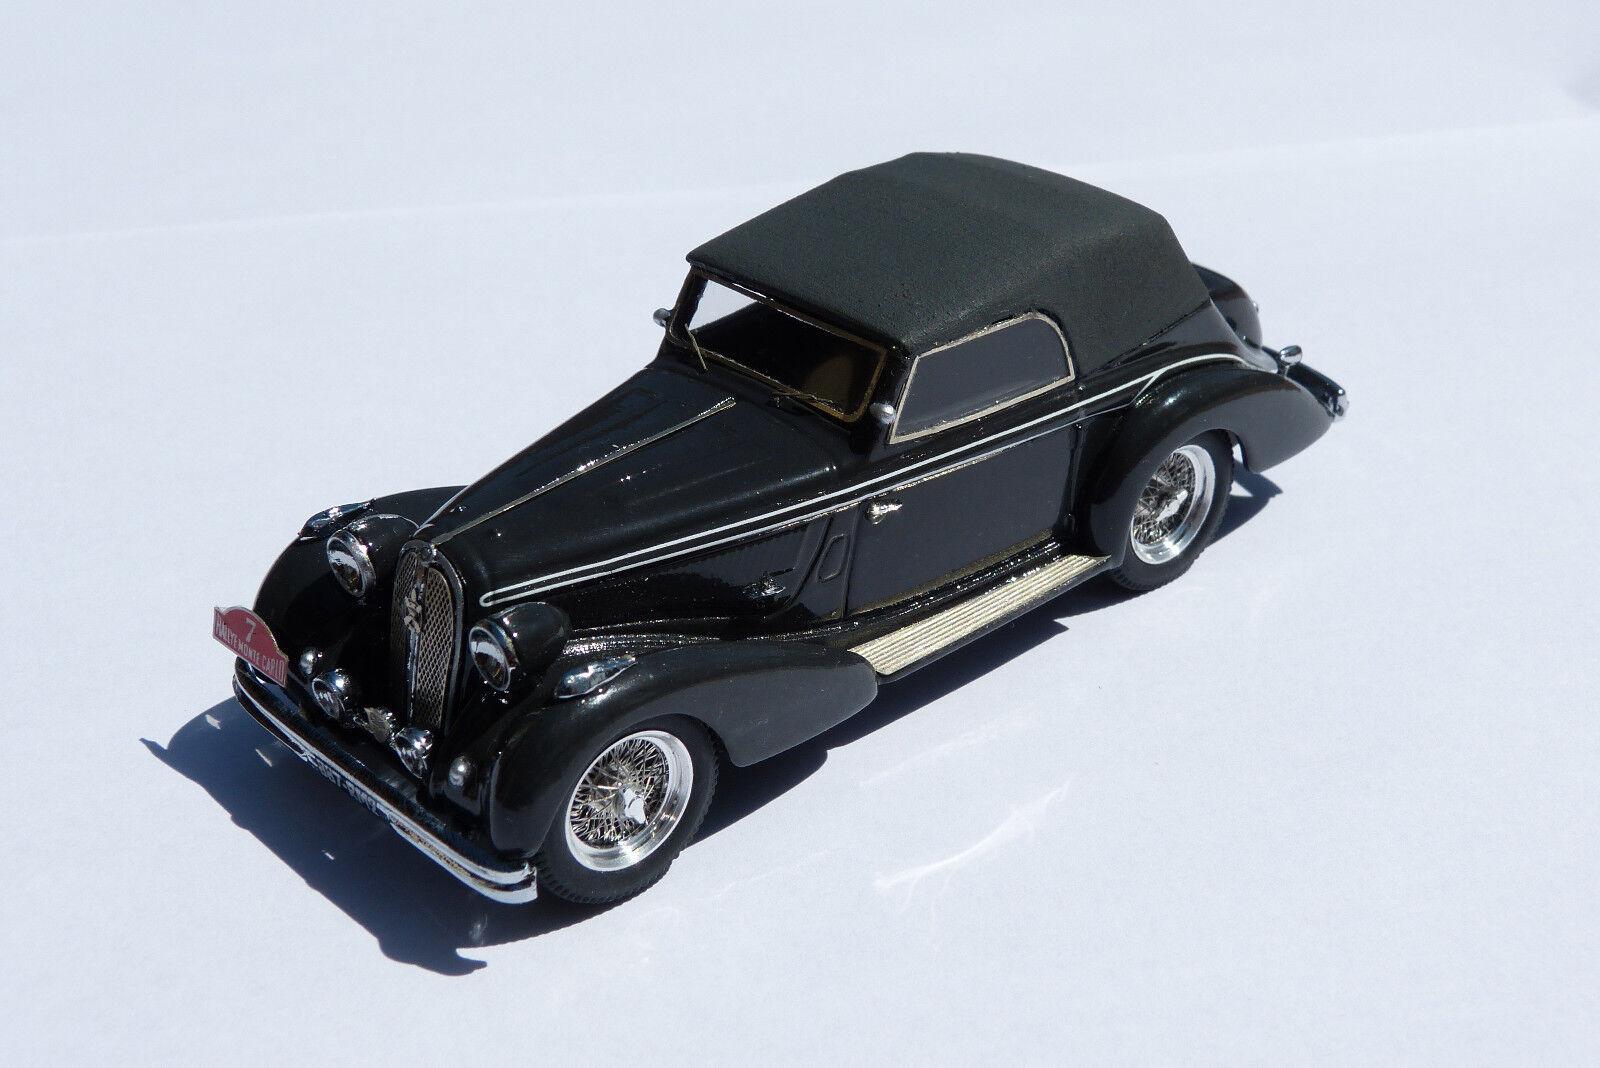 Kit pour miniatyr bil CCC  varmchkiss 20 cv Monte billo 1939 r r rip rough 65533;65533f 169